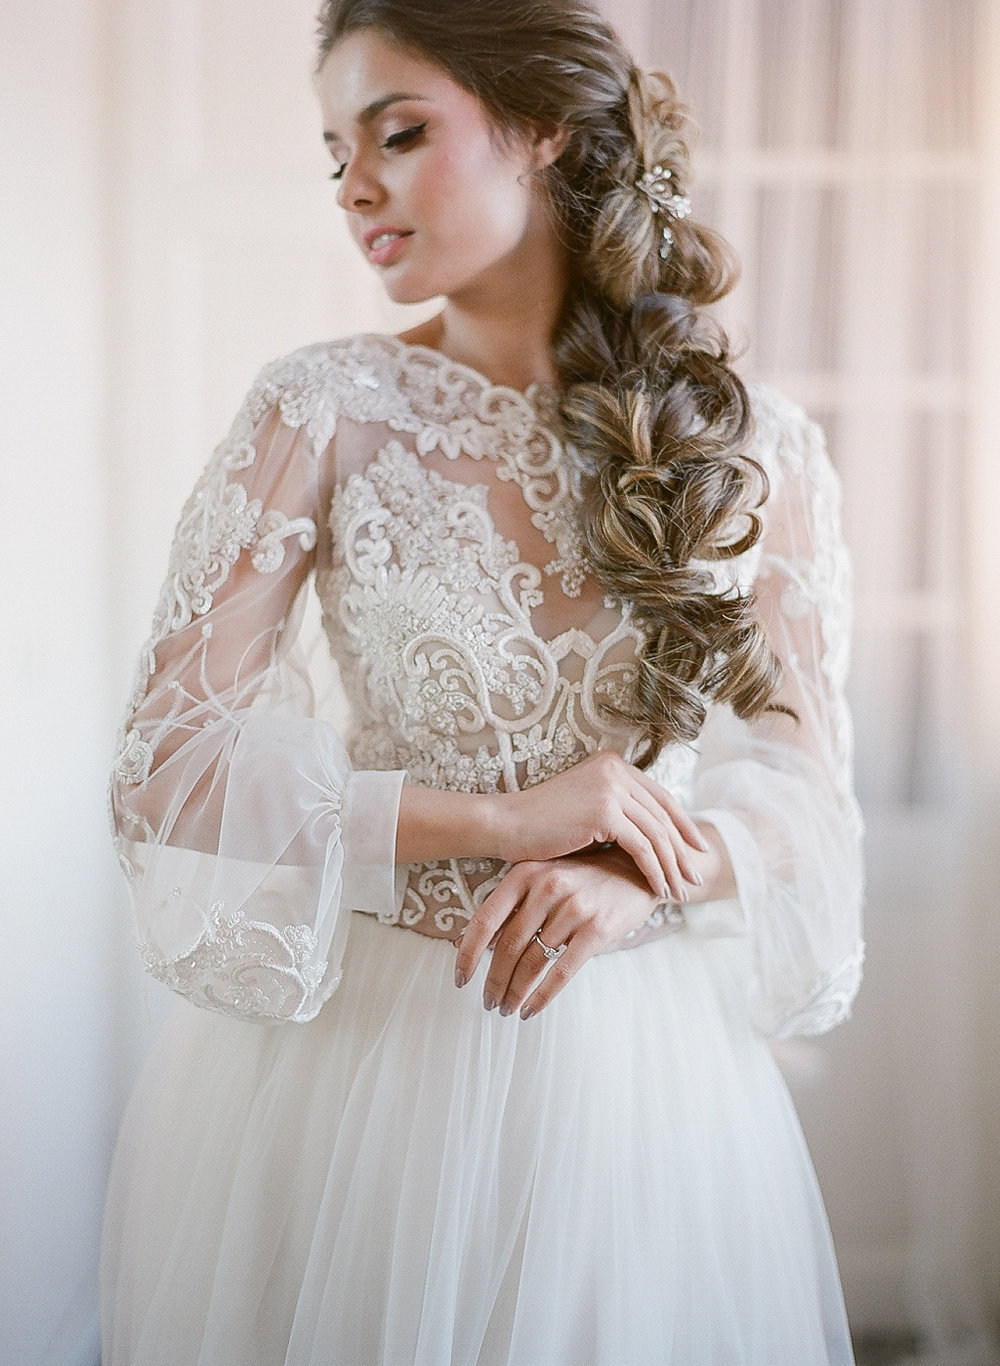 Fine art bridal look - Europe